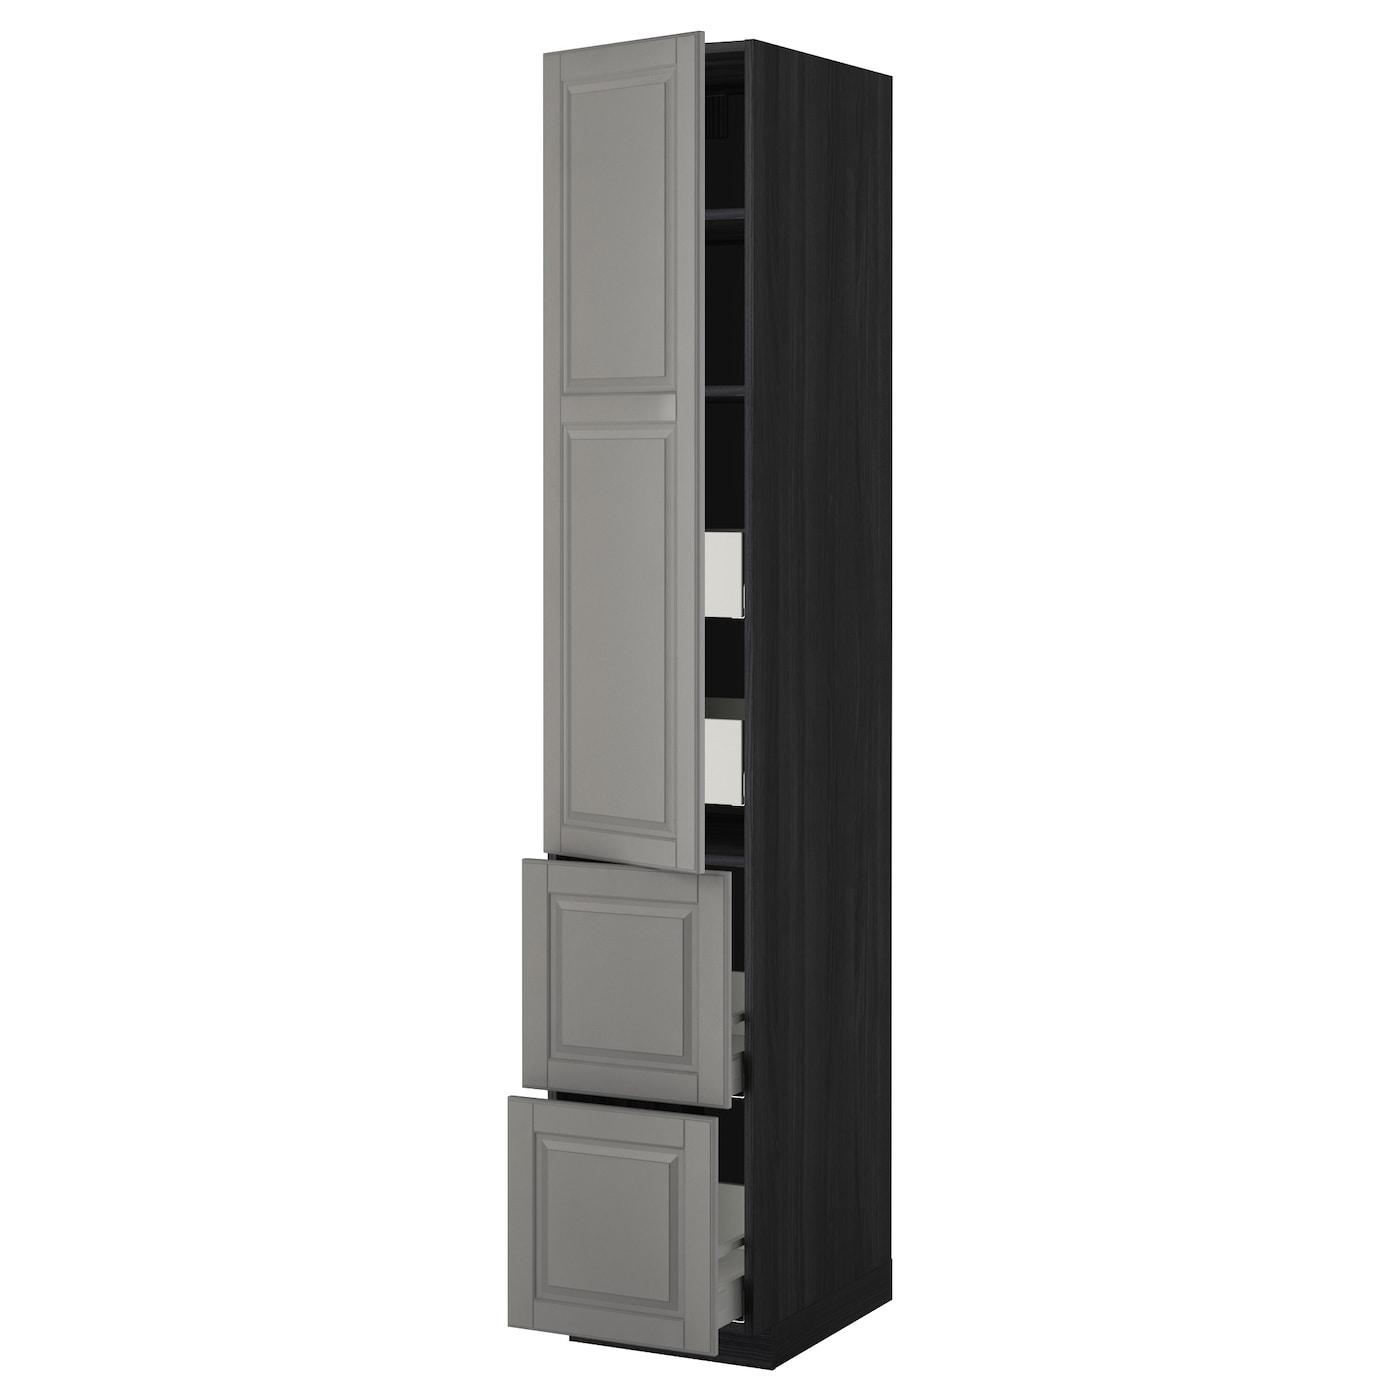 metod maximera hoge kast plank 4 lade deur 2 front zwart bodbyn grijs 40x60x220 cm ikea. Black Bedroom Furniture Sets. Home Design Ideas